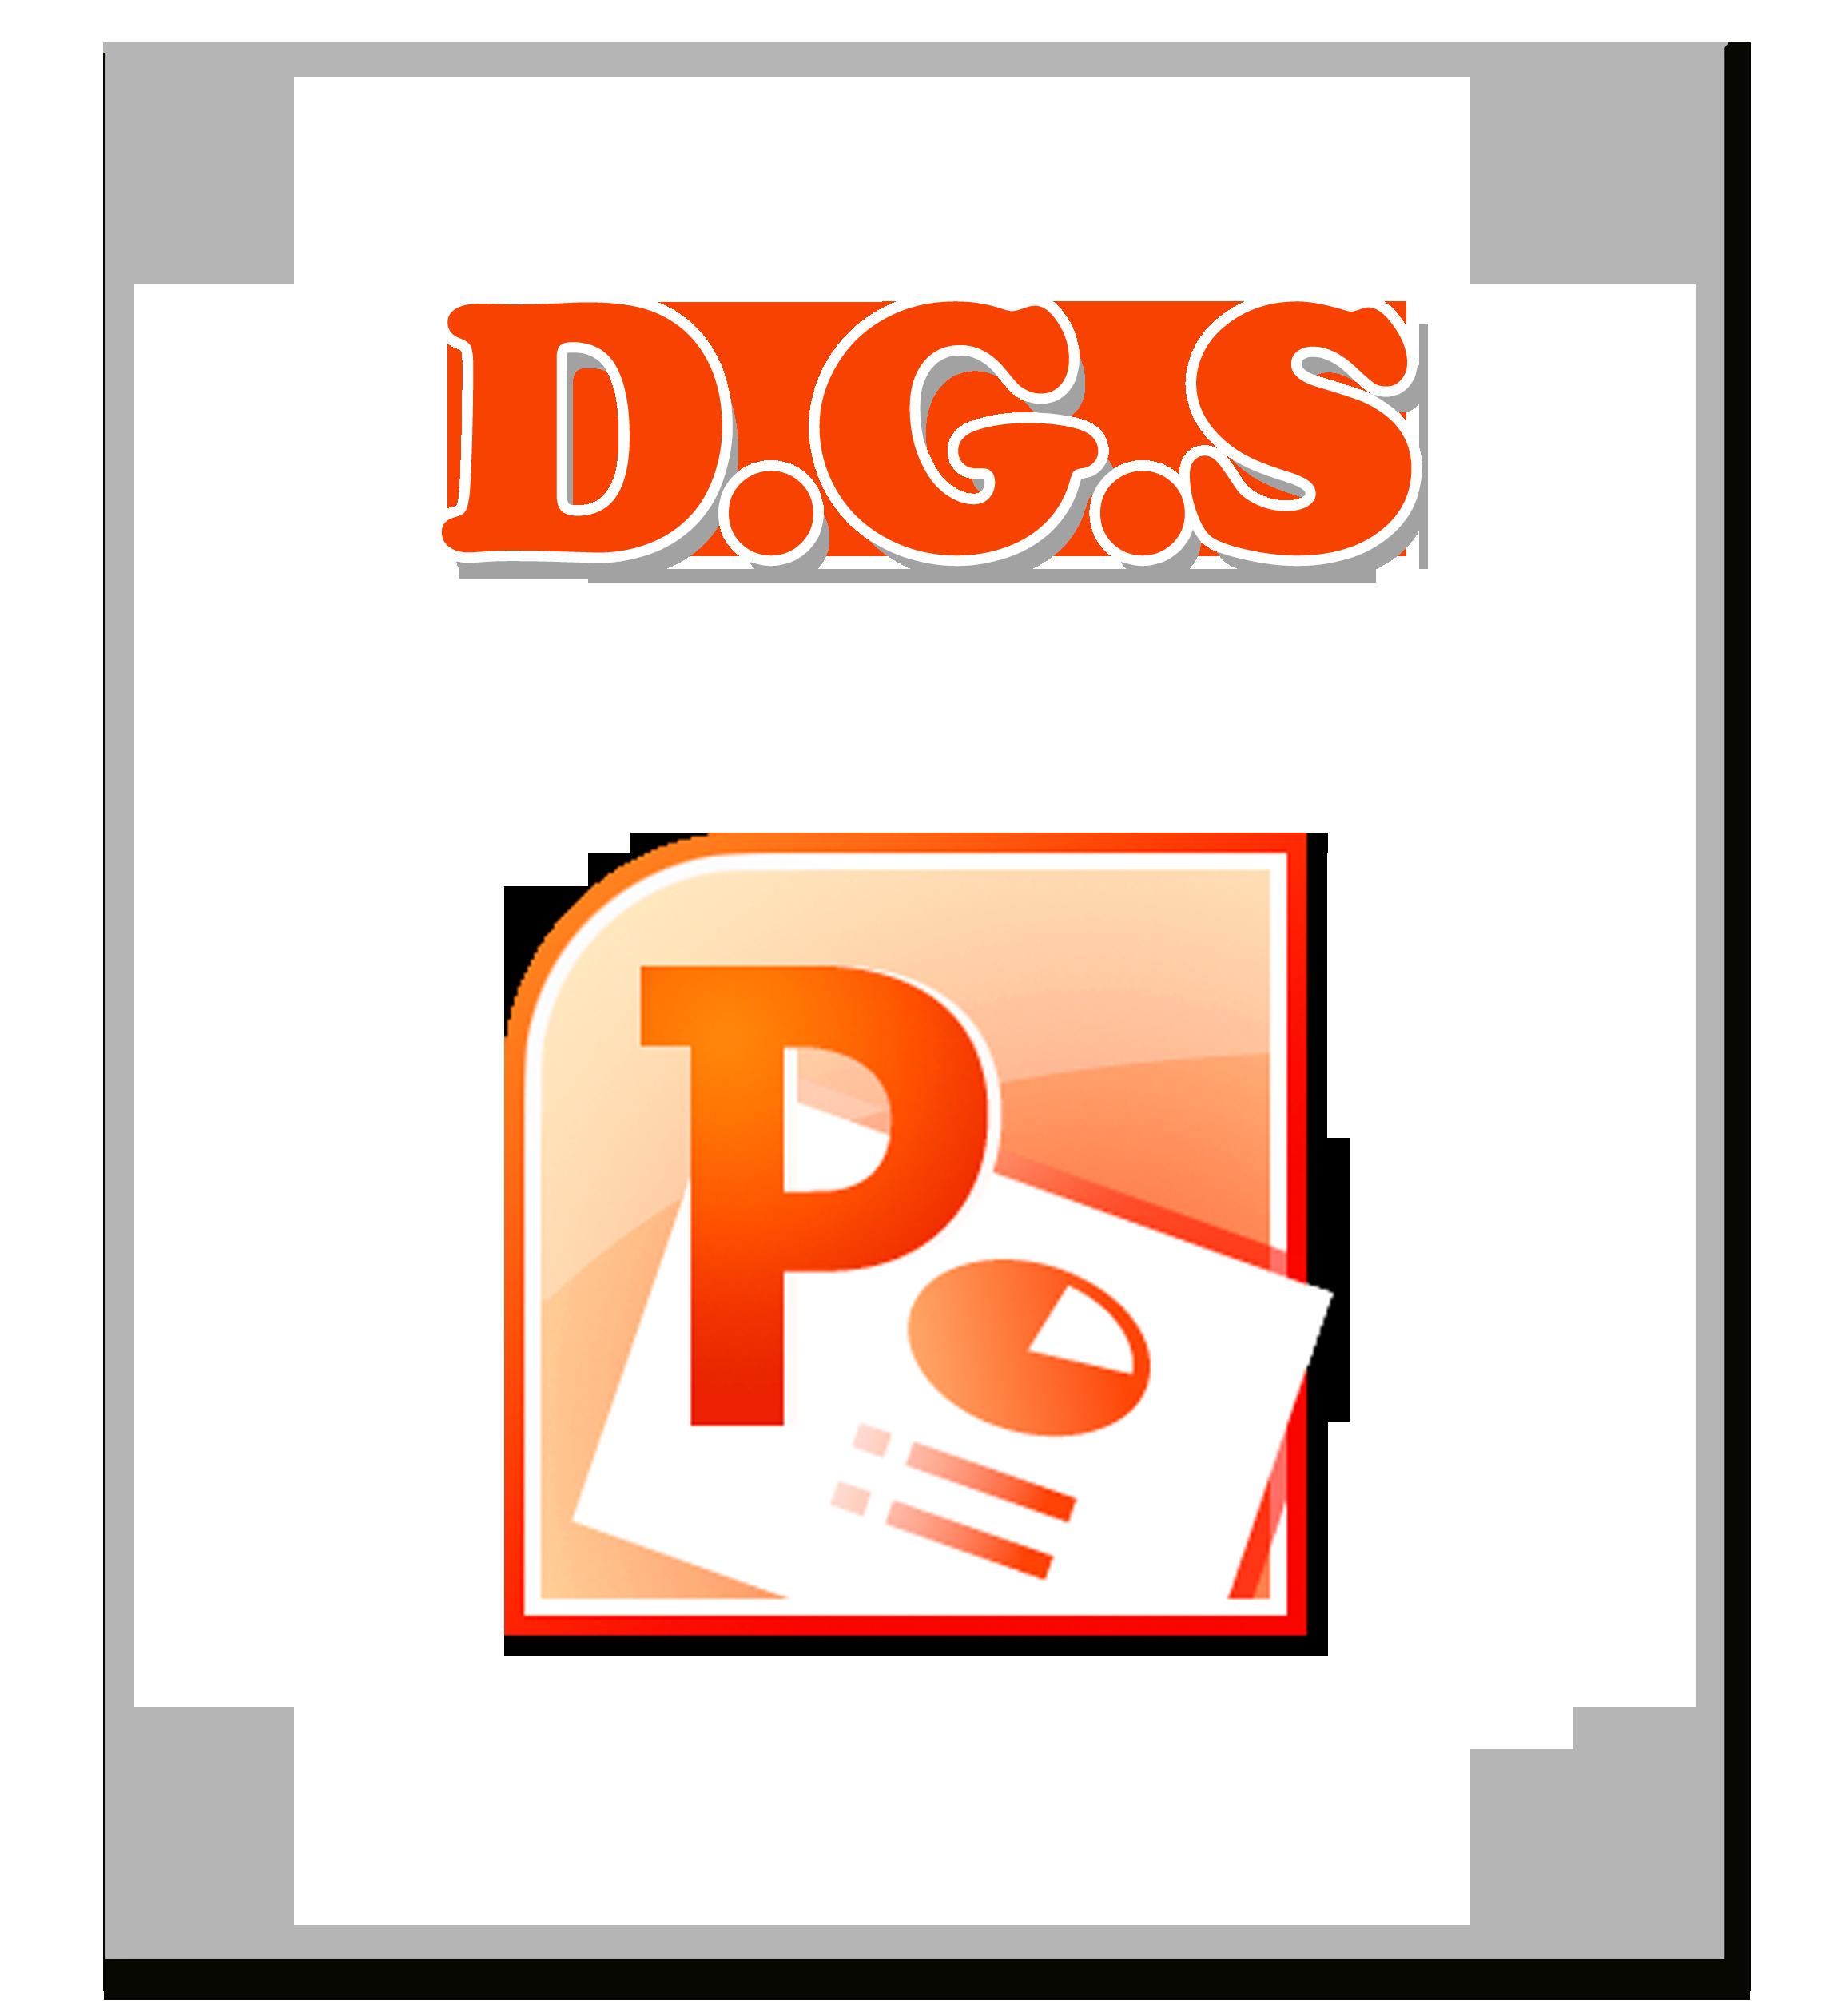 SMSP - DGC